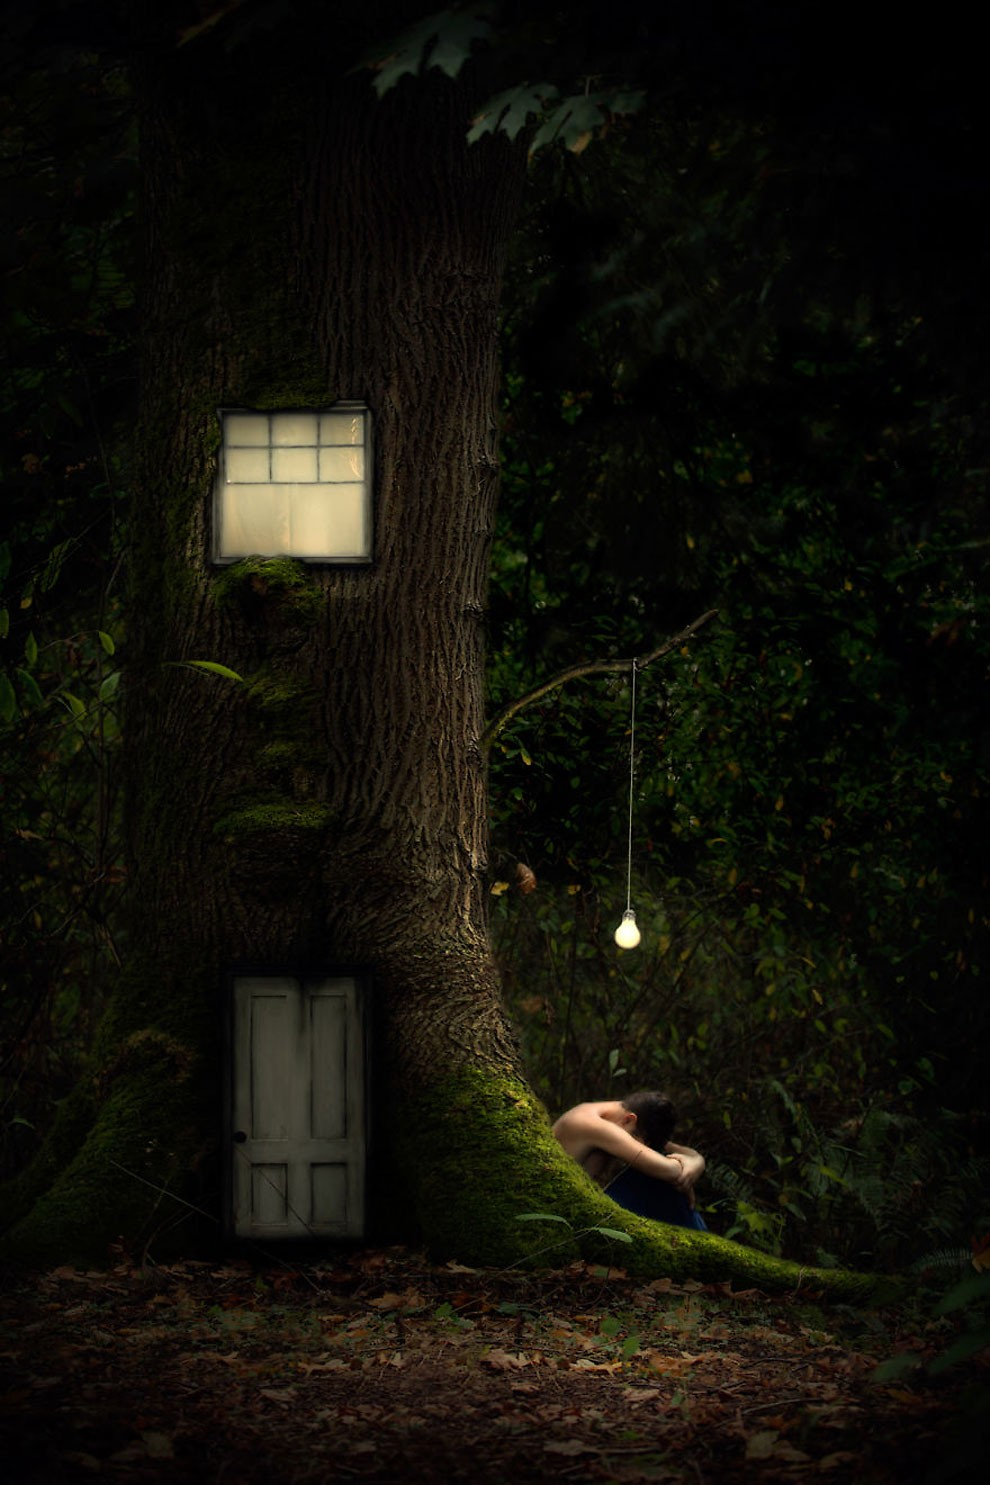 fotografia-bambini-animali-surreali-fantasy-gabriel-tomoiaga-03